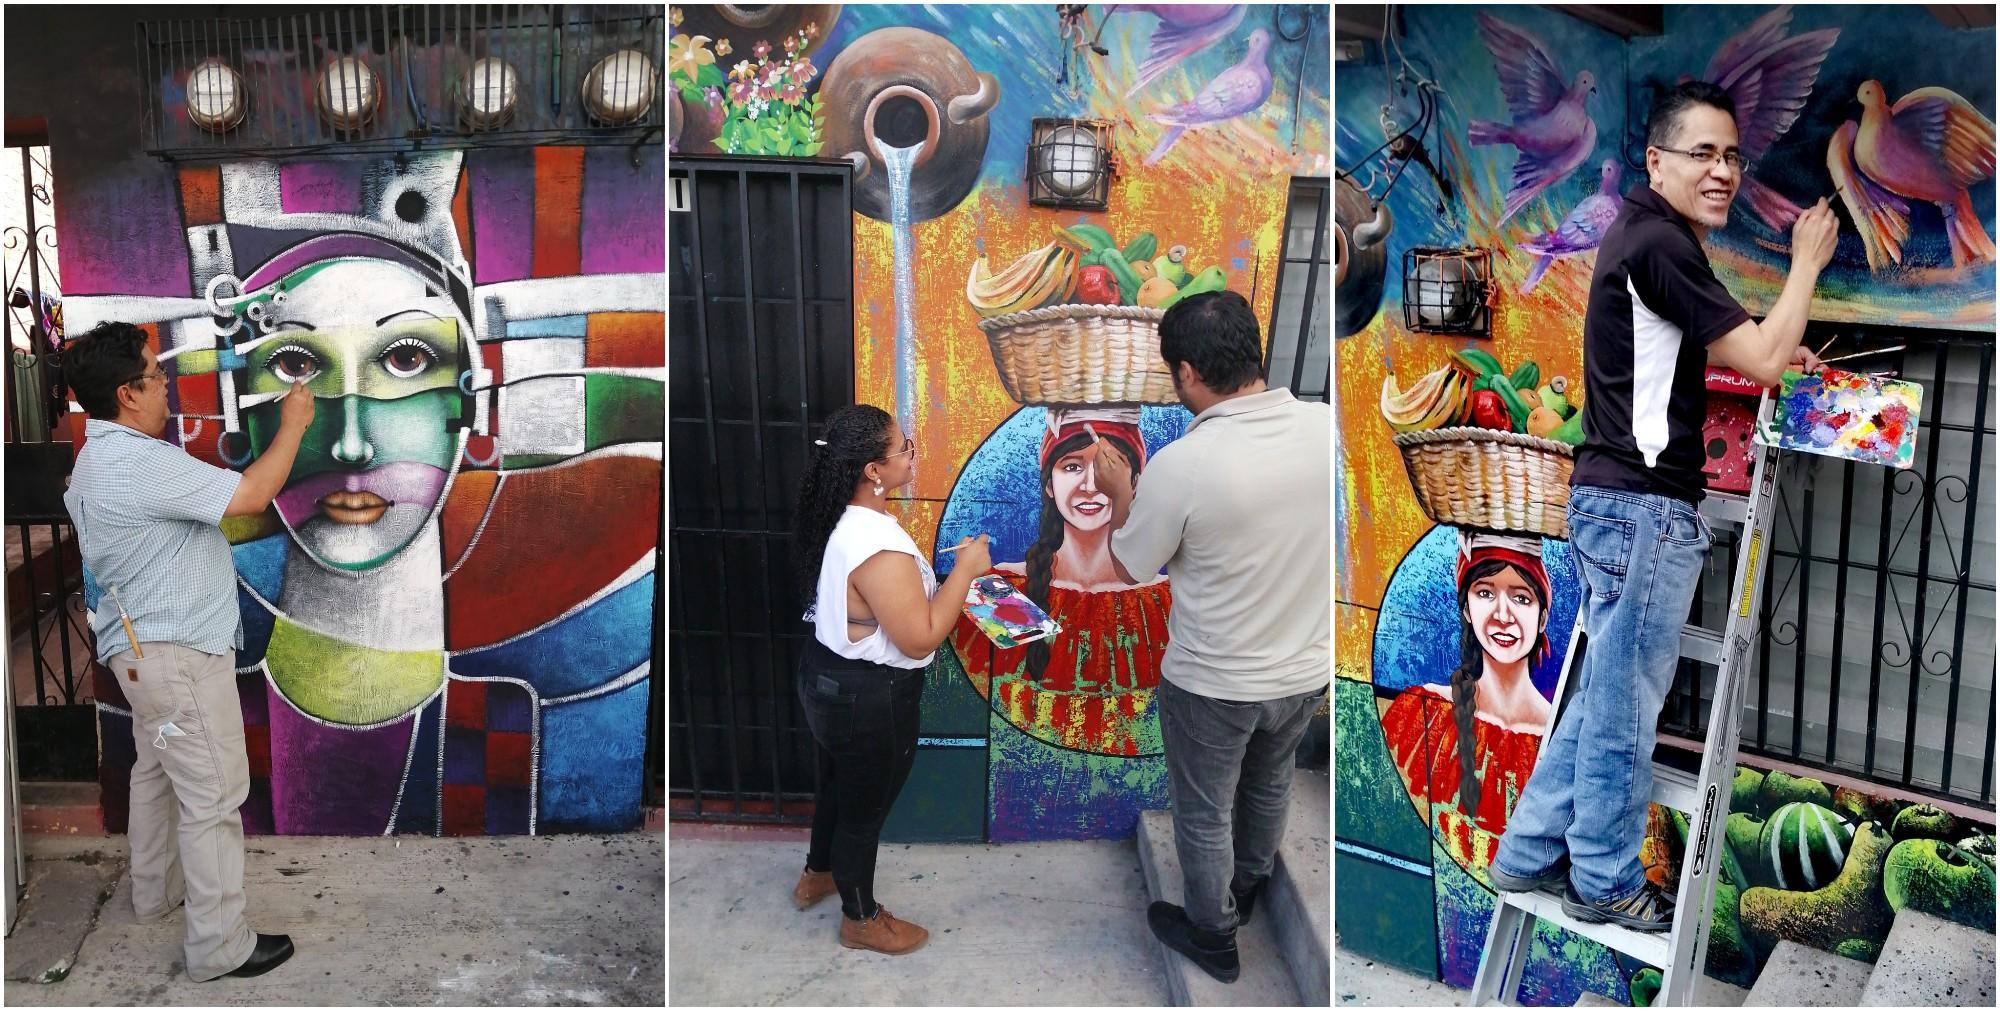 Asociación Hondureña de Artistas Plásticos crea un mural en Las Palmas